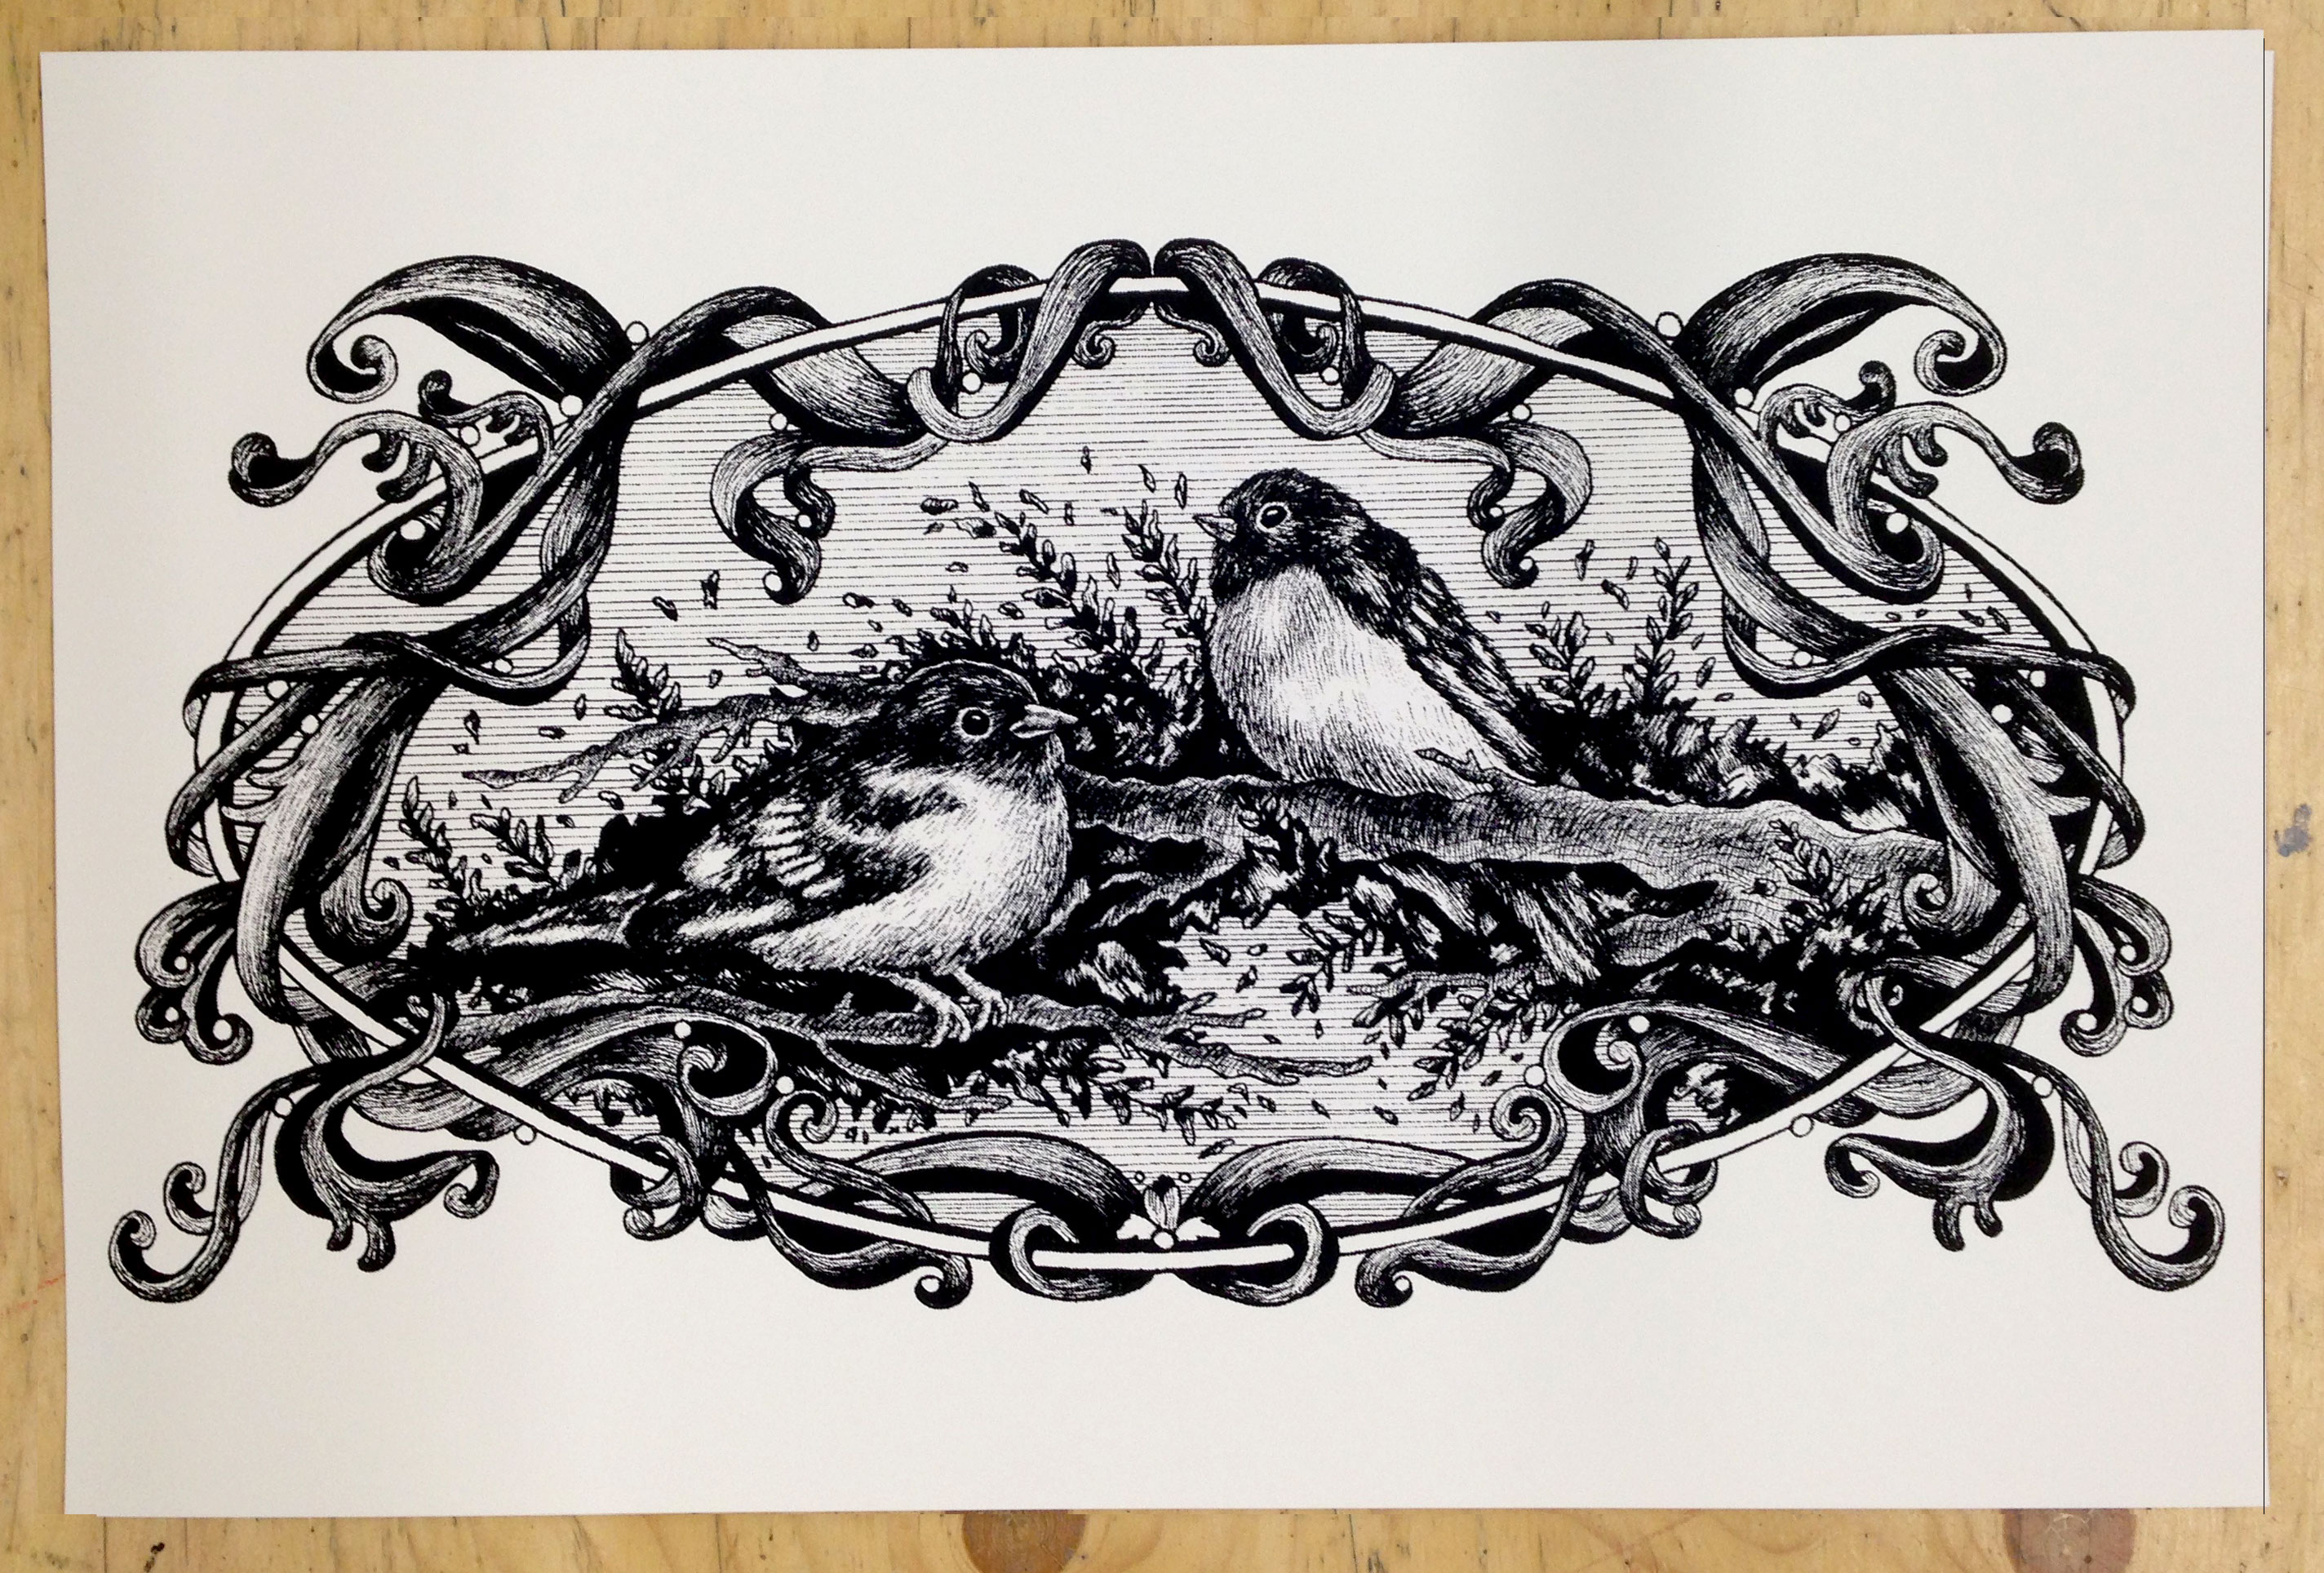 New prints from Jessica Hrycyk